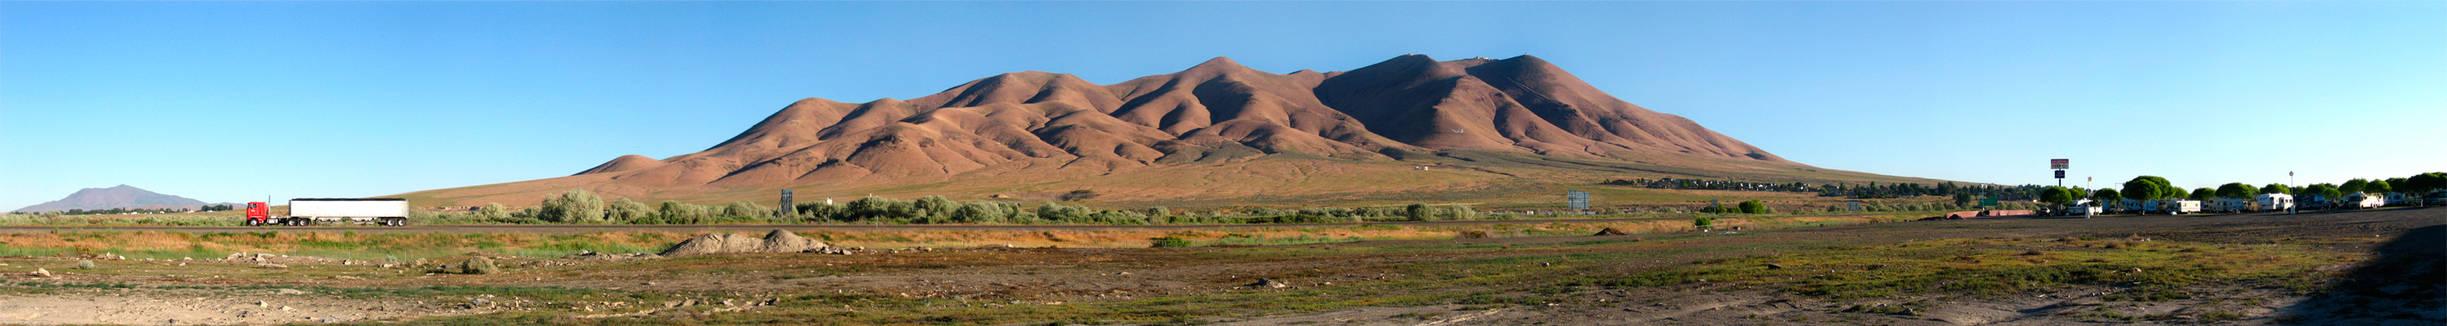 Winnemucca Mountain